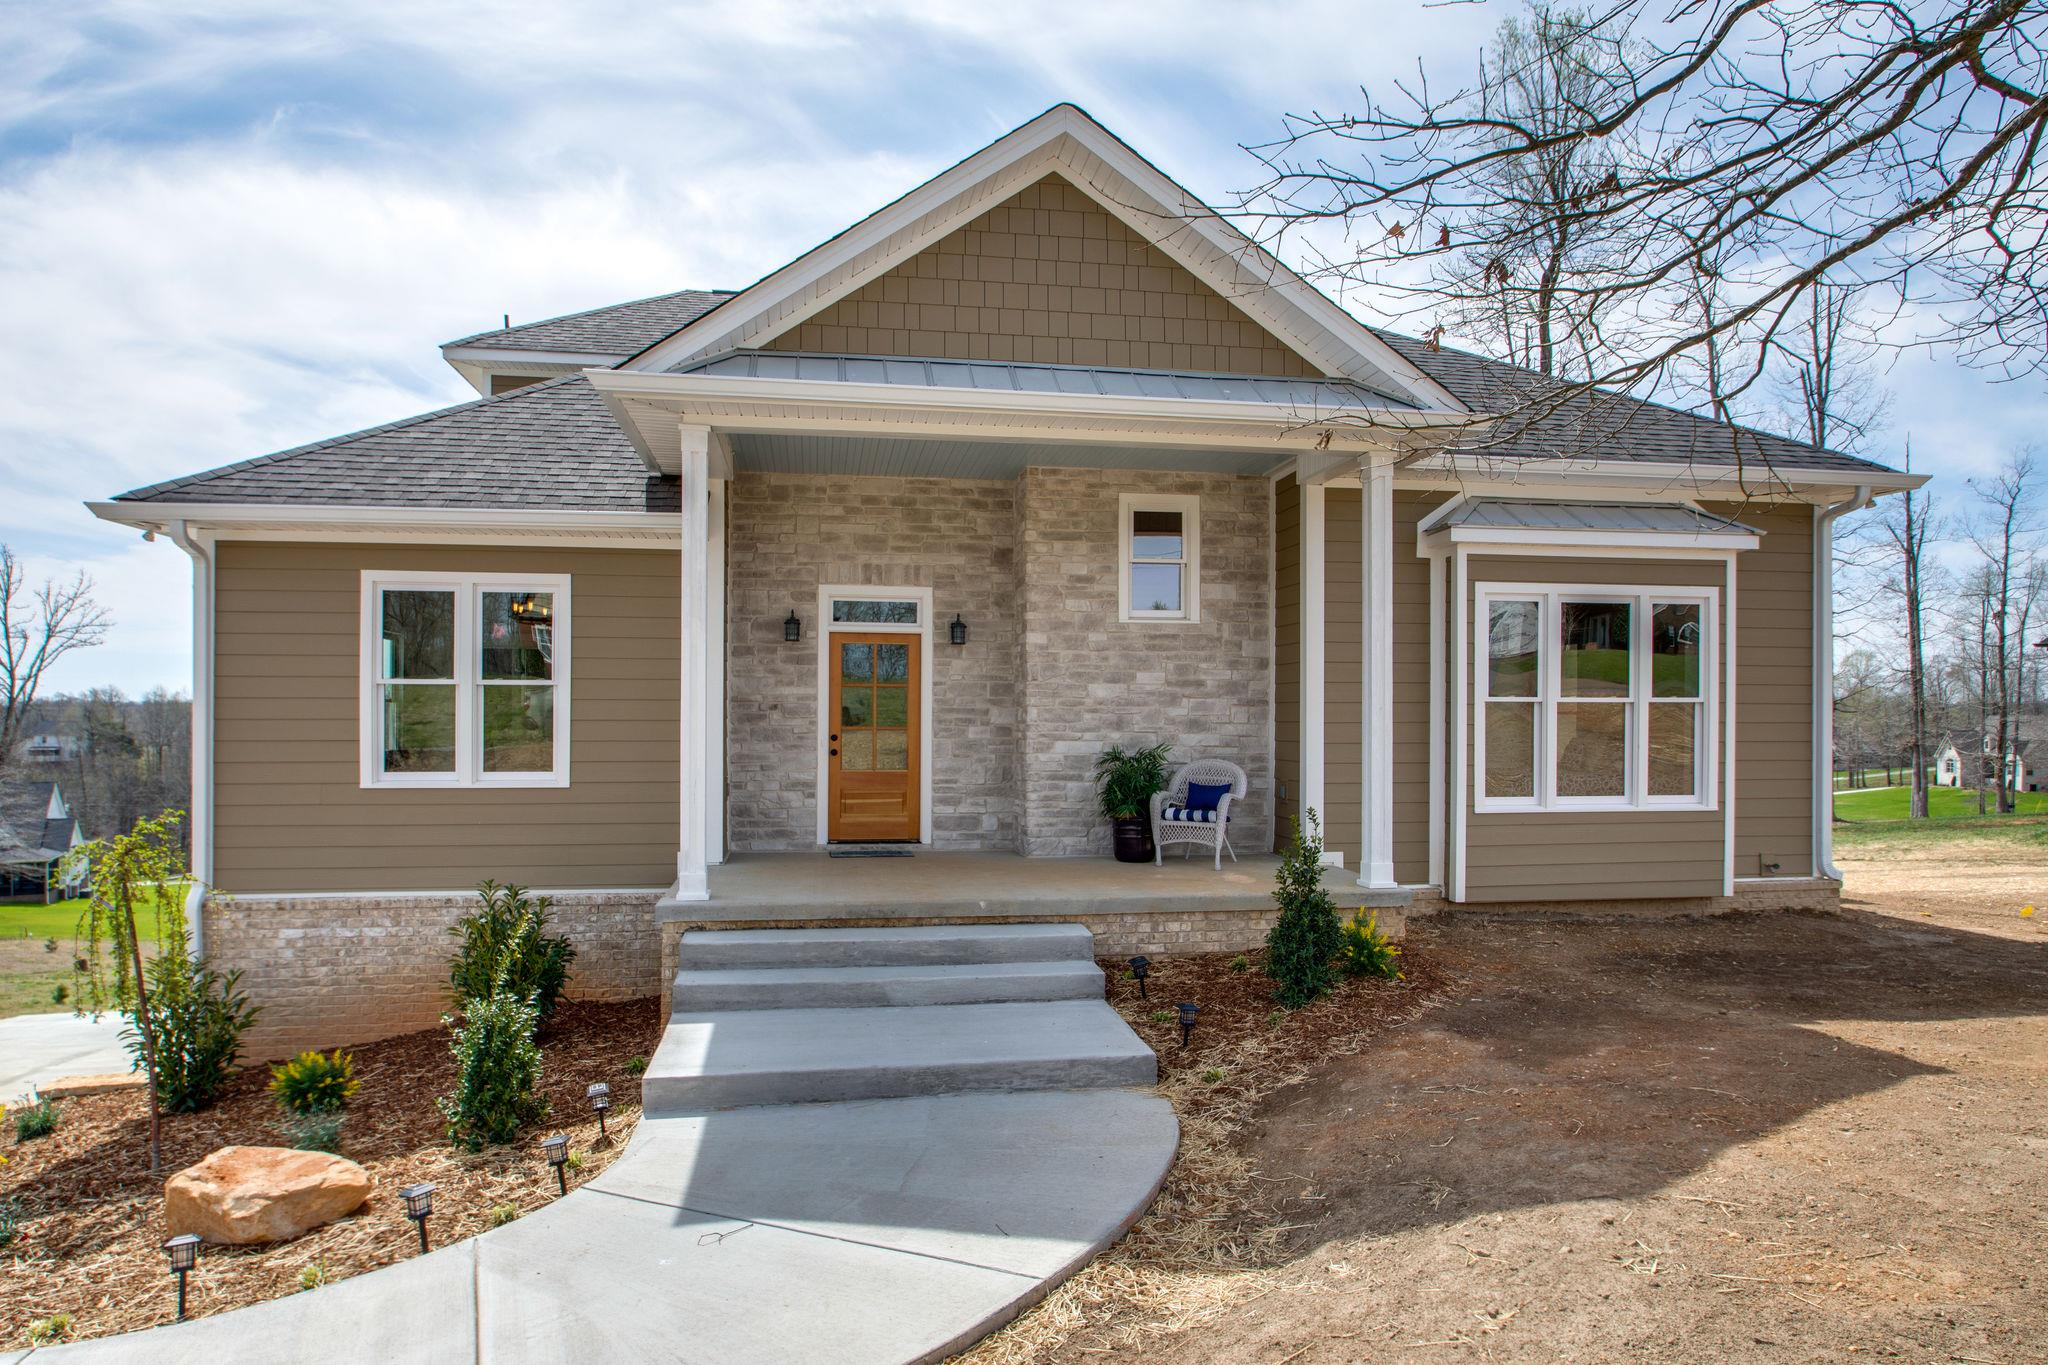 106 Inverness Dr, Burns, TN 37029 - Burns, TN real estate listing